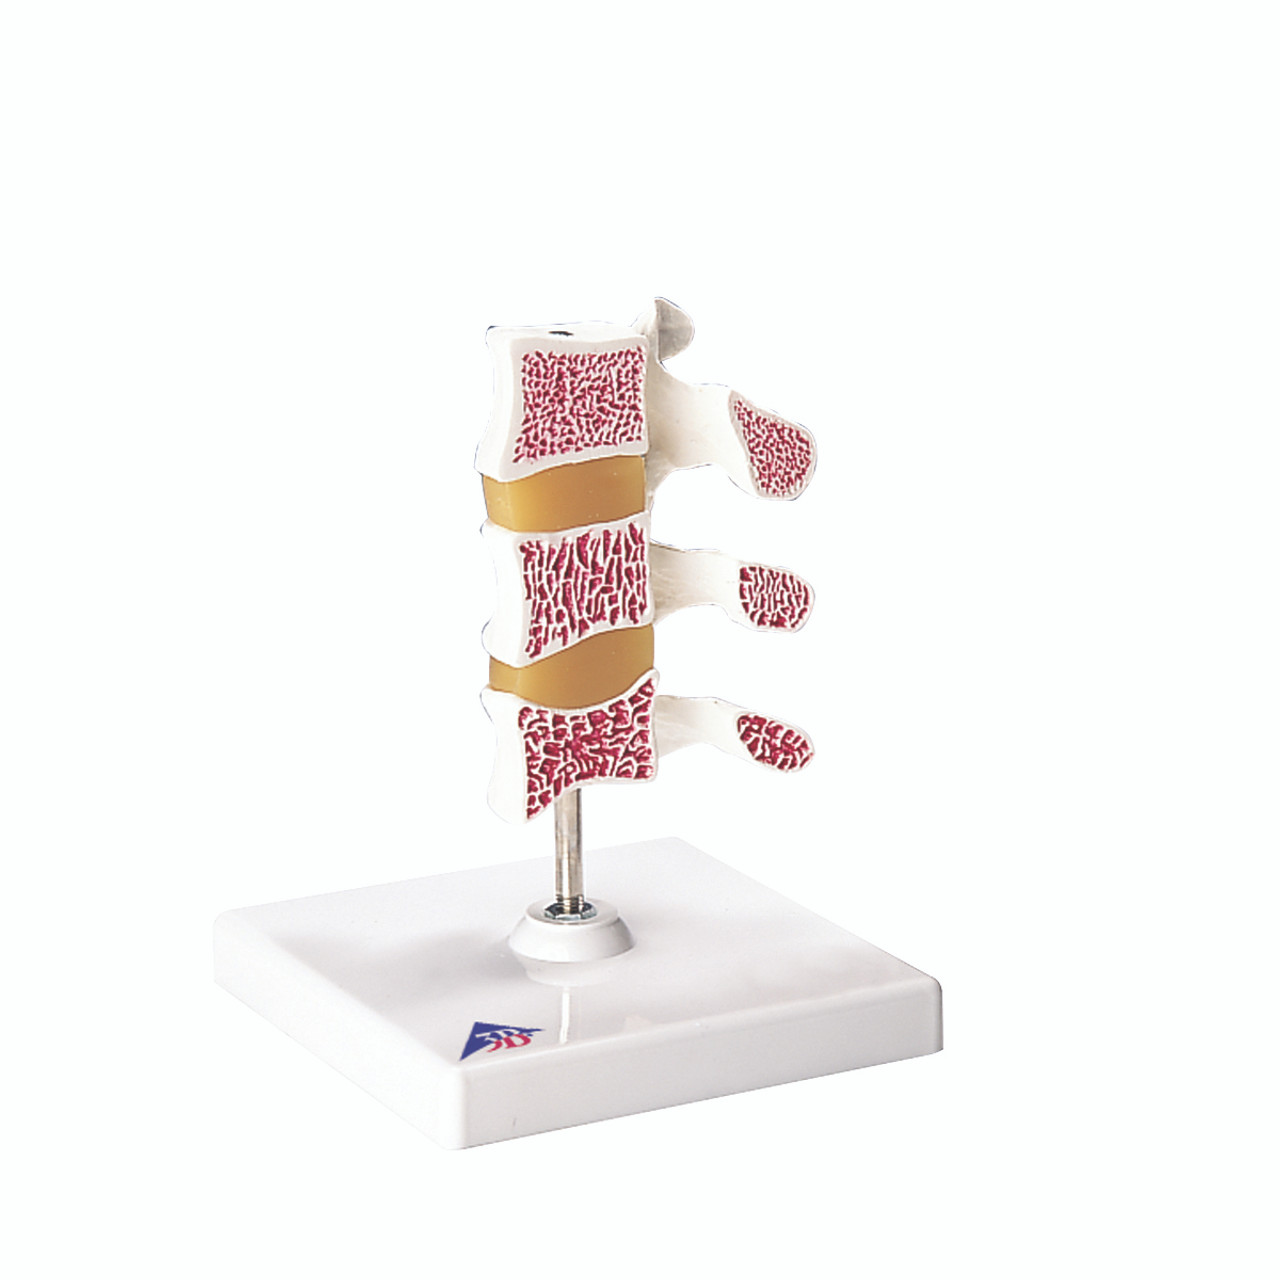 Anatomical Model - Deluxe Osteoporosis Model (3 Vertebrae)